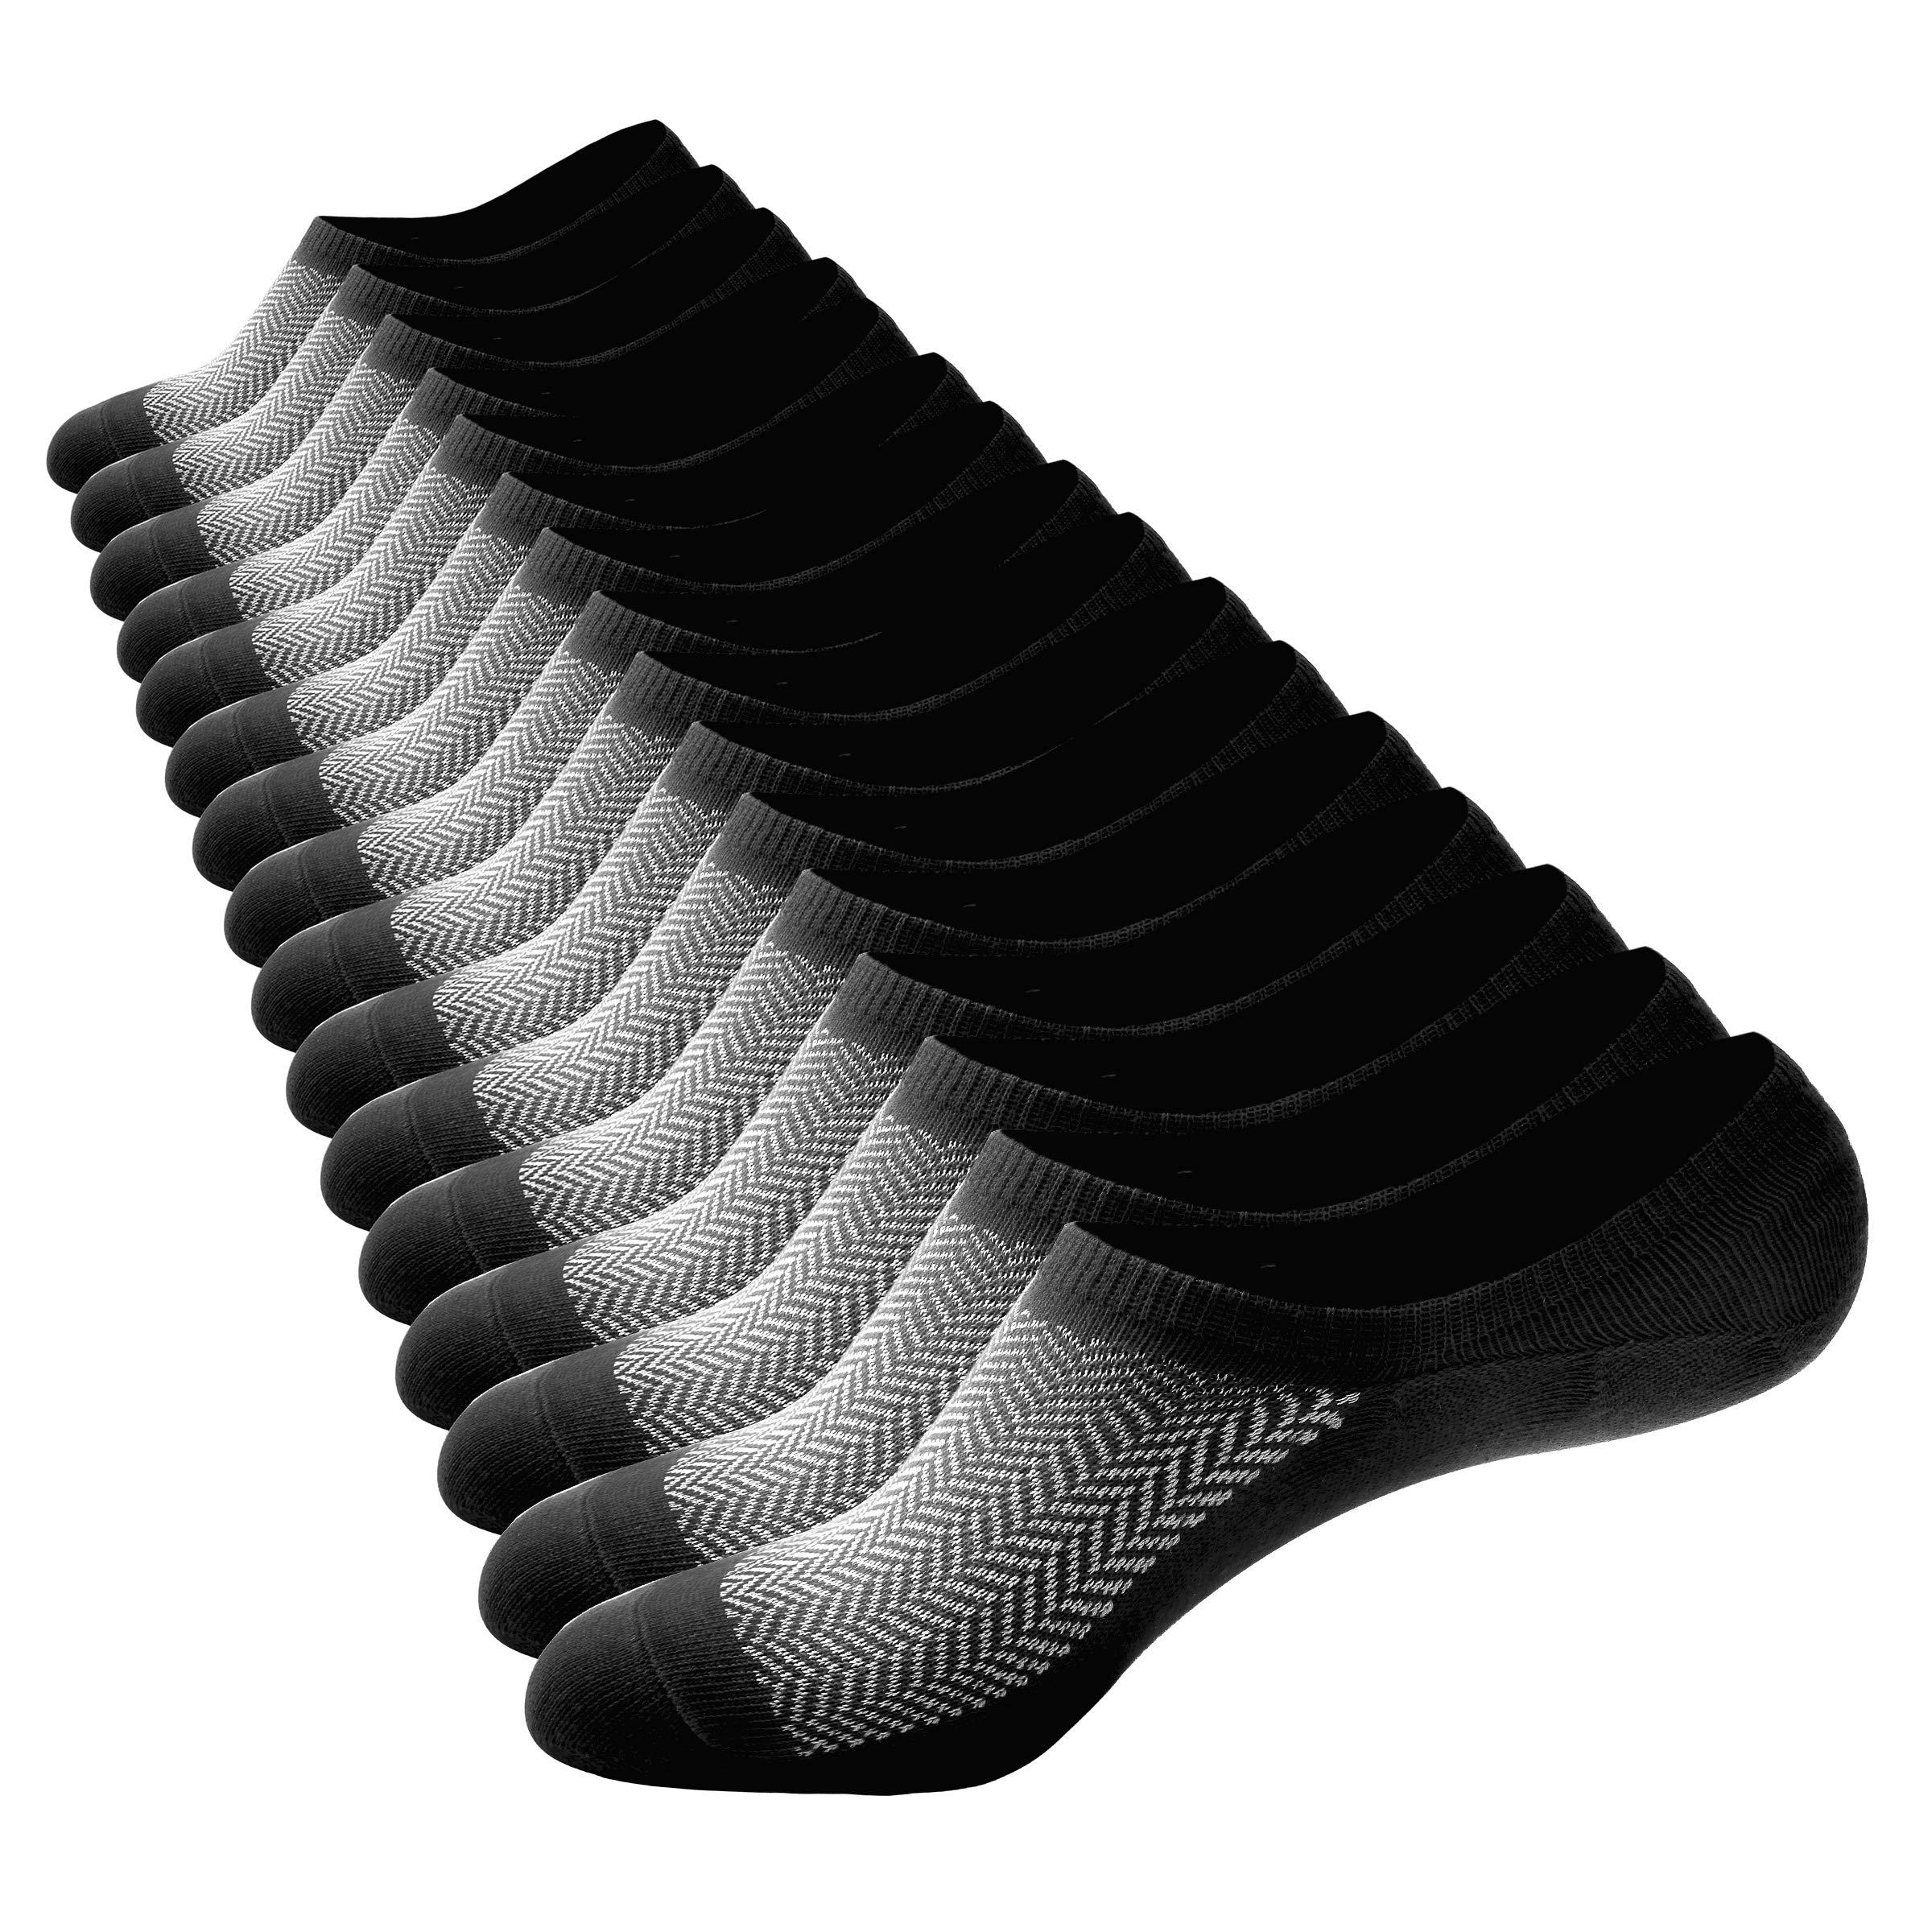 No Show Socks Men Cotton Low Cut Boat Socks - Casual Ankle Non Slip Short Socks Women,8 Pairs 5-13